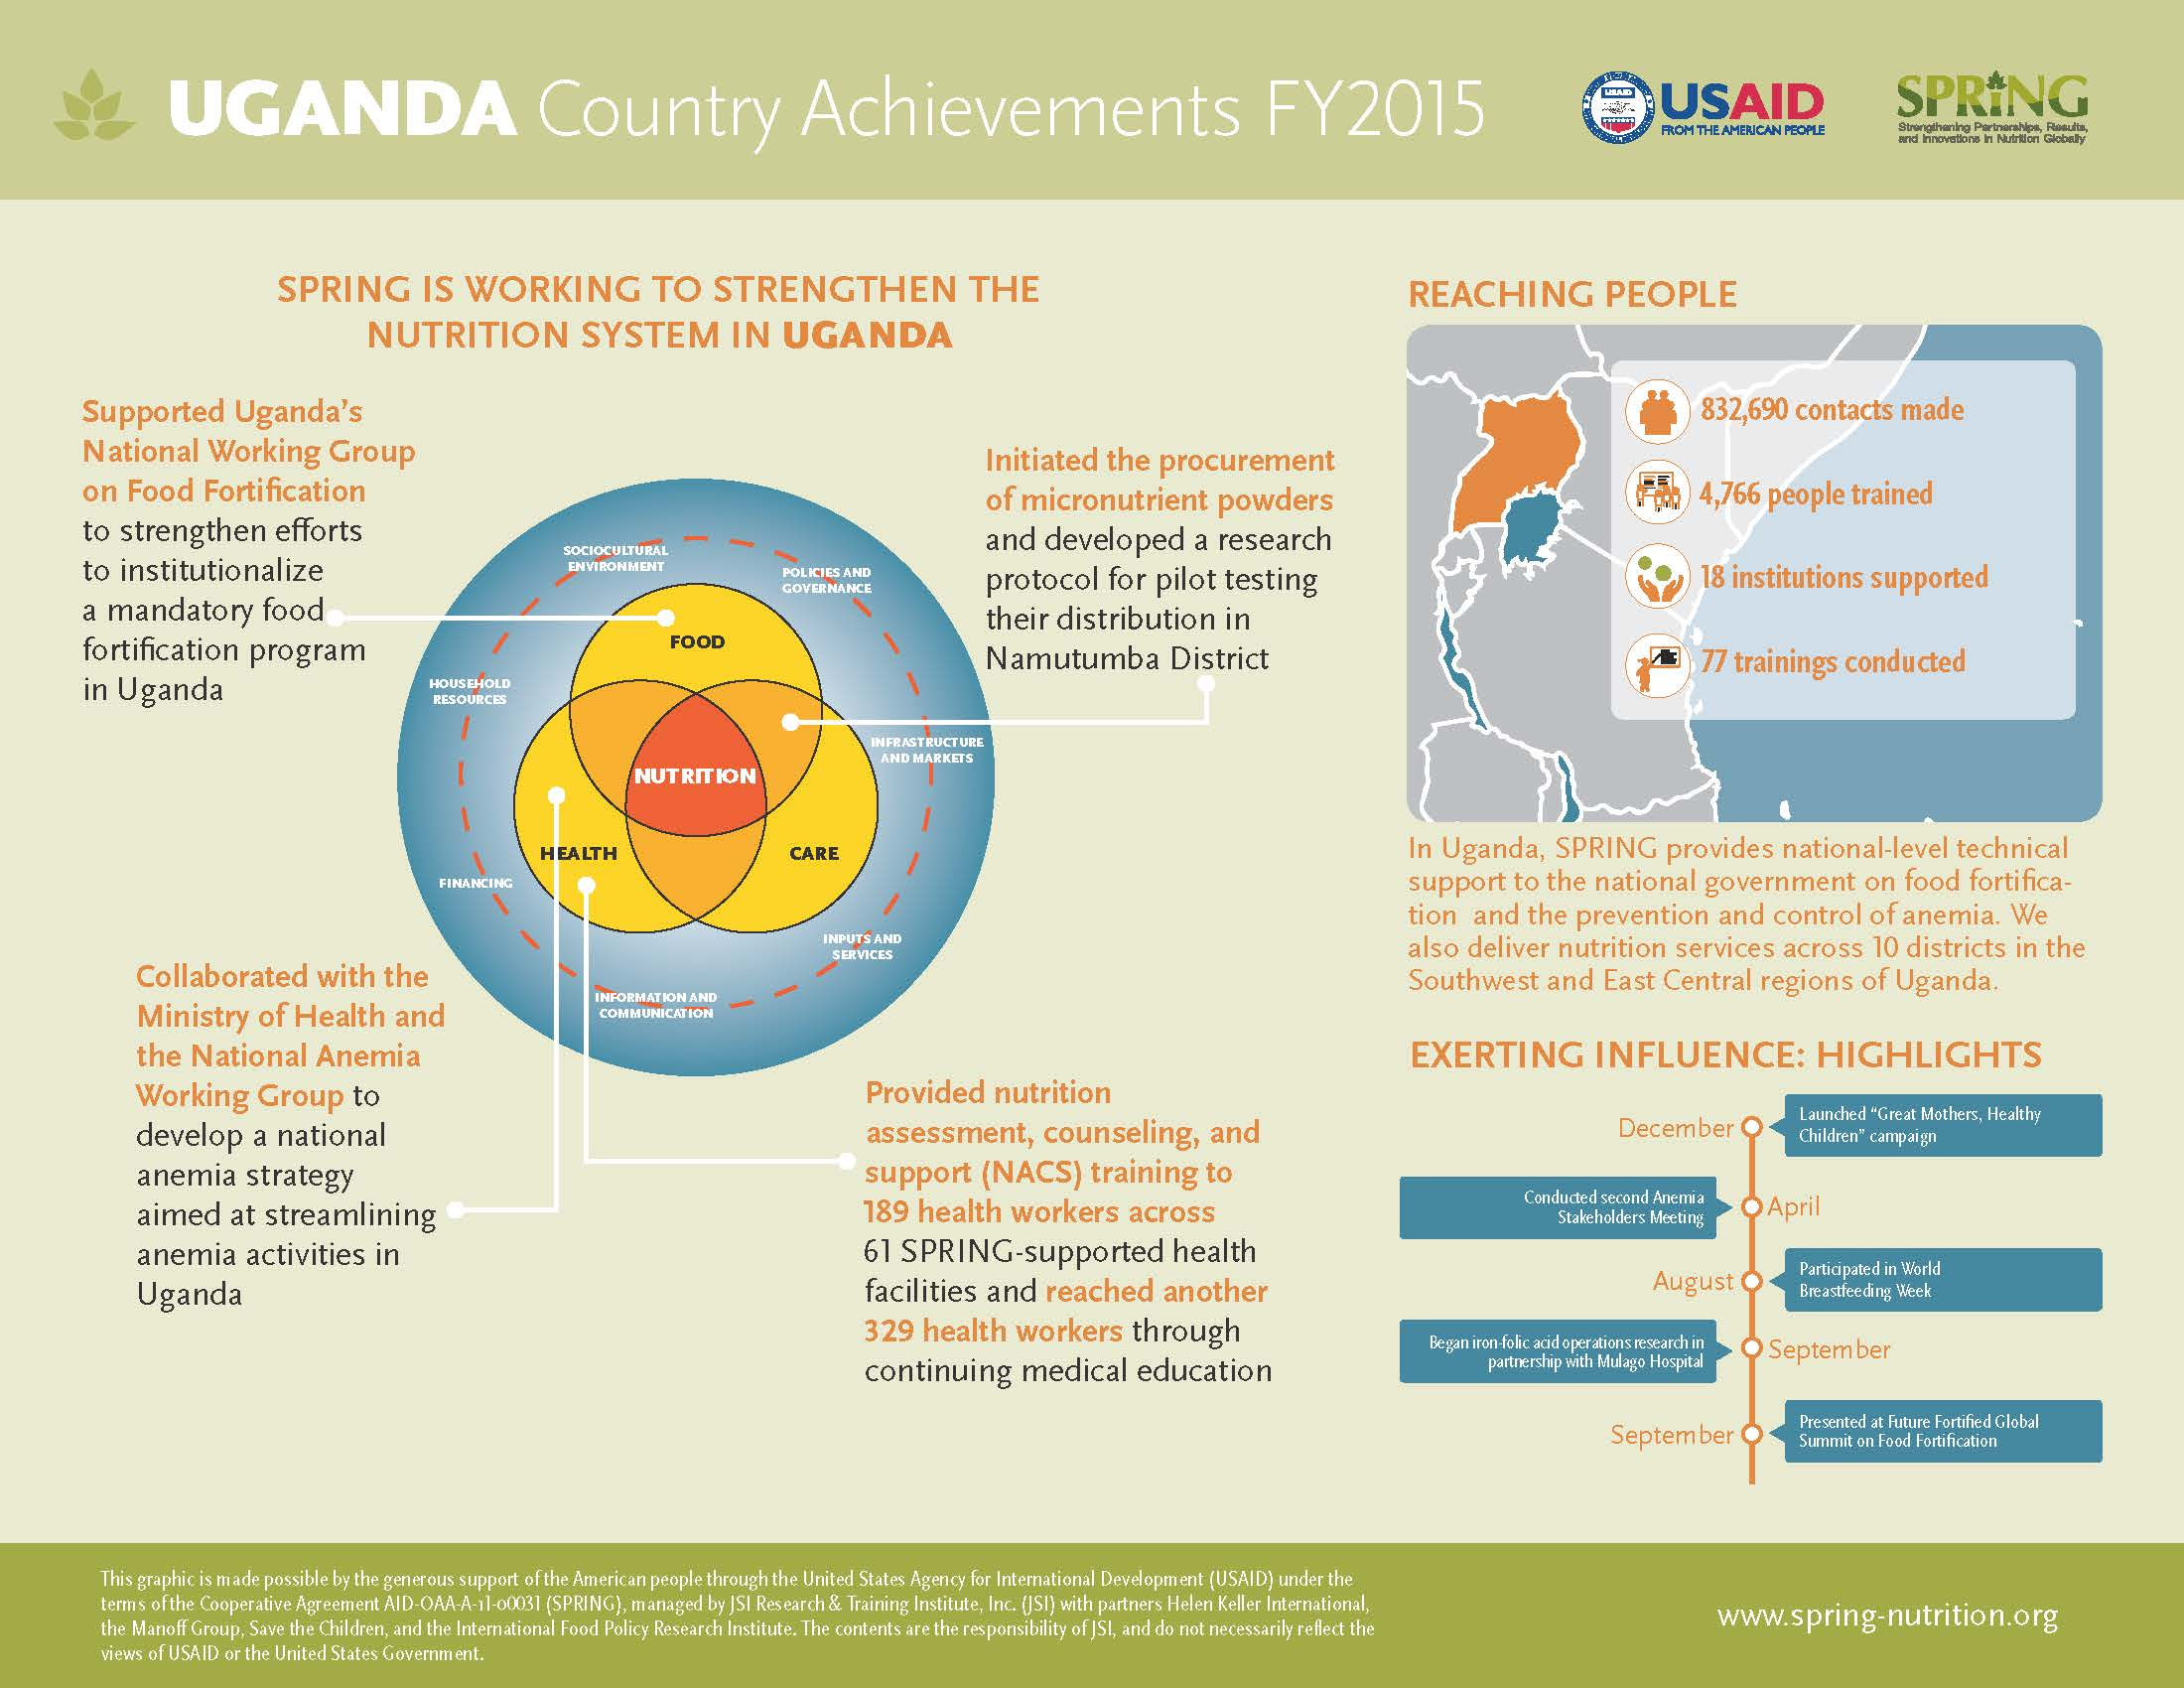 SPRING 2015 Overview - Uganda